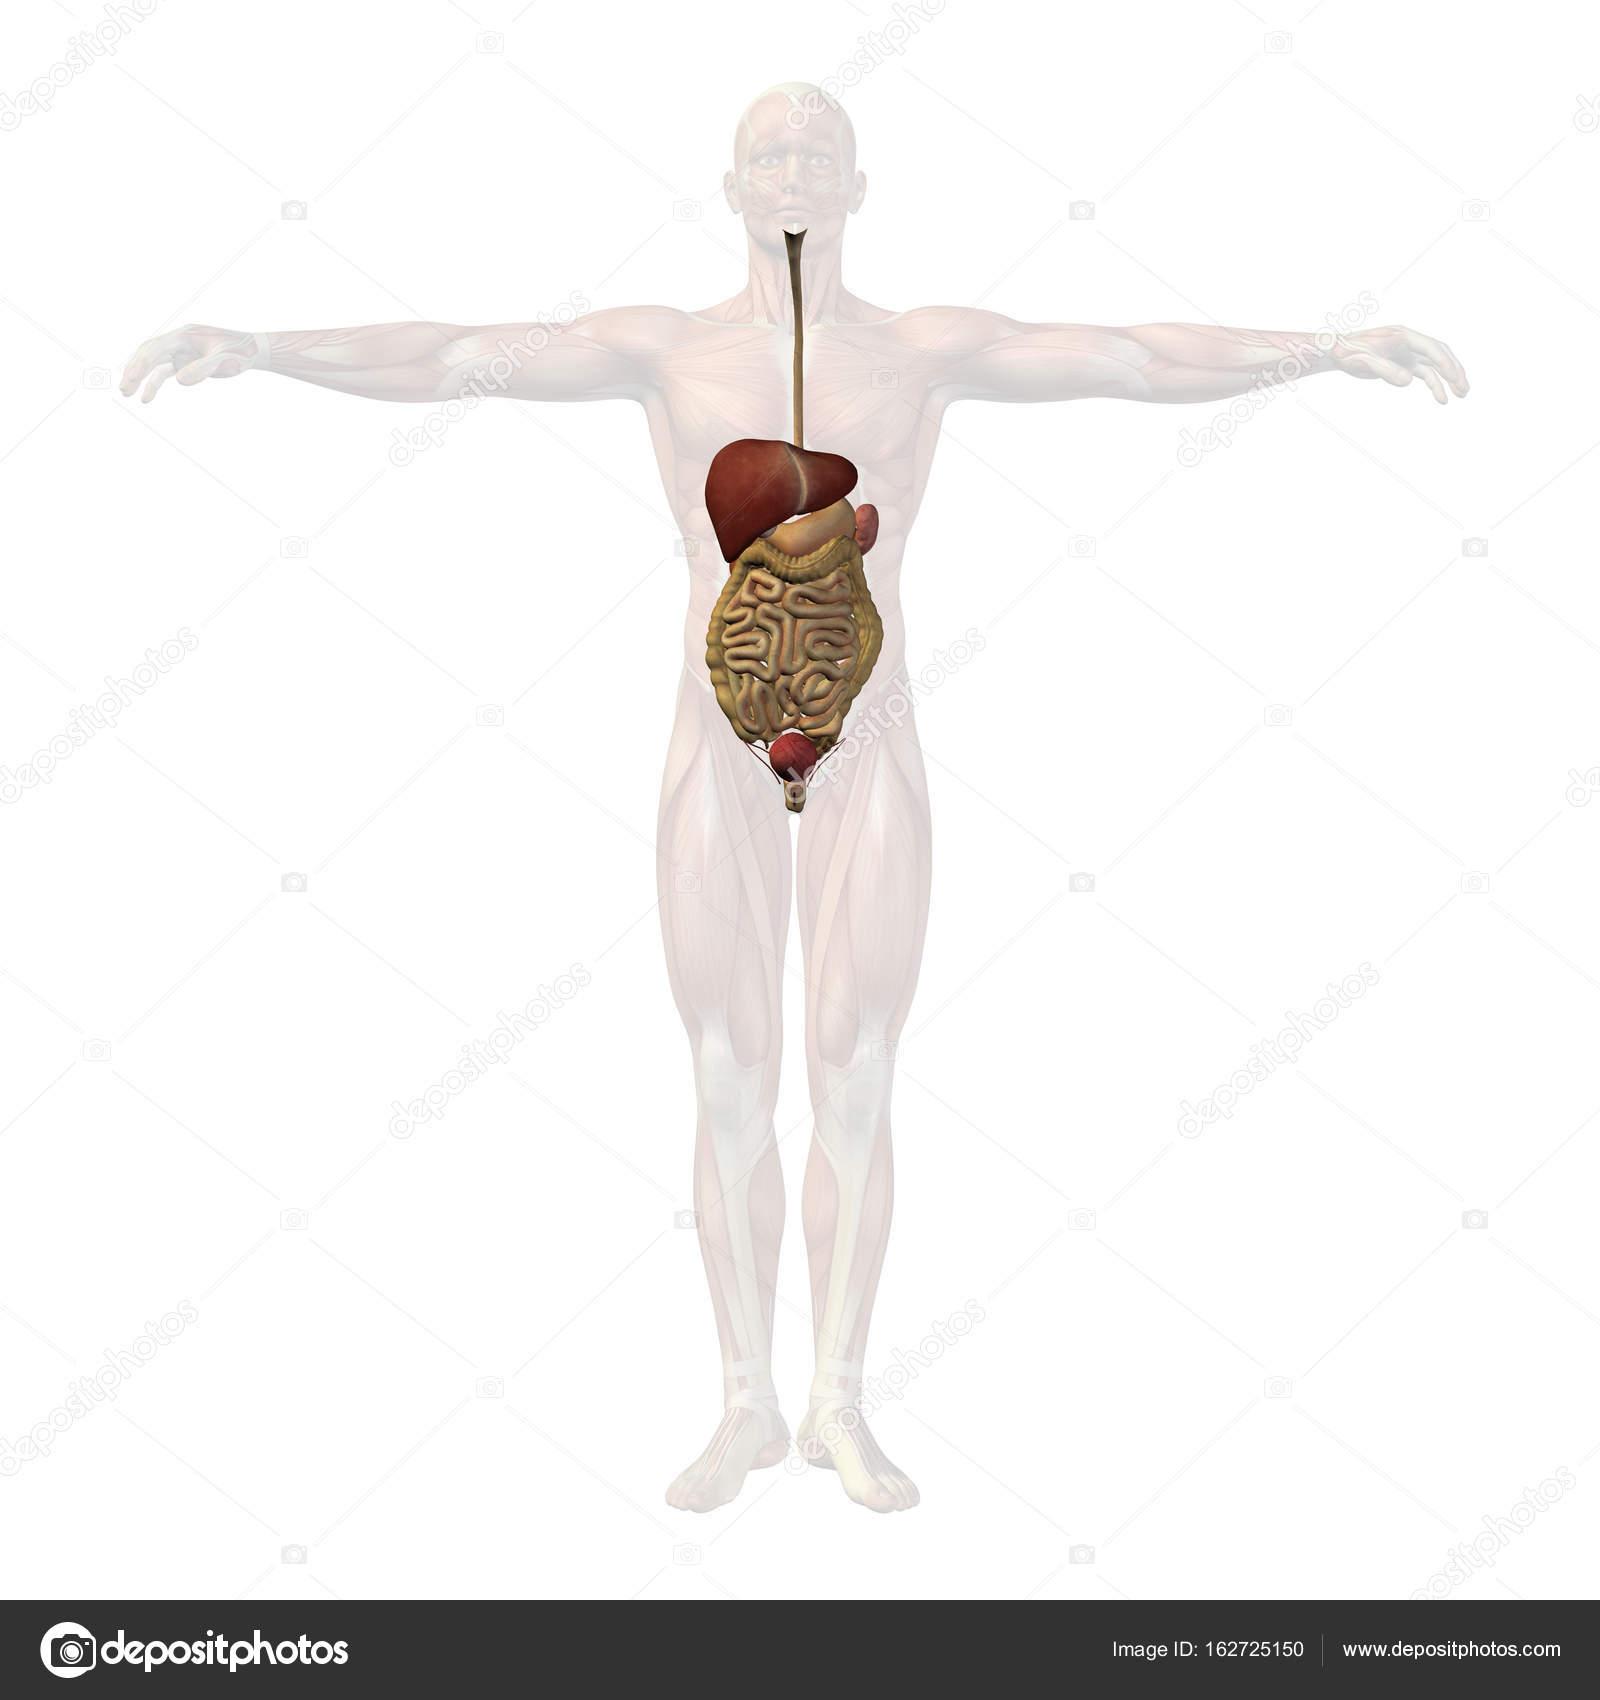 Human Anatomy Illustration Stock Photo Design36 162725150